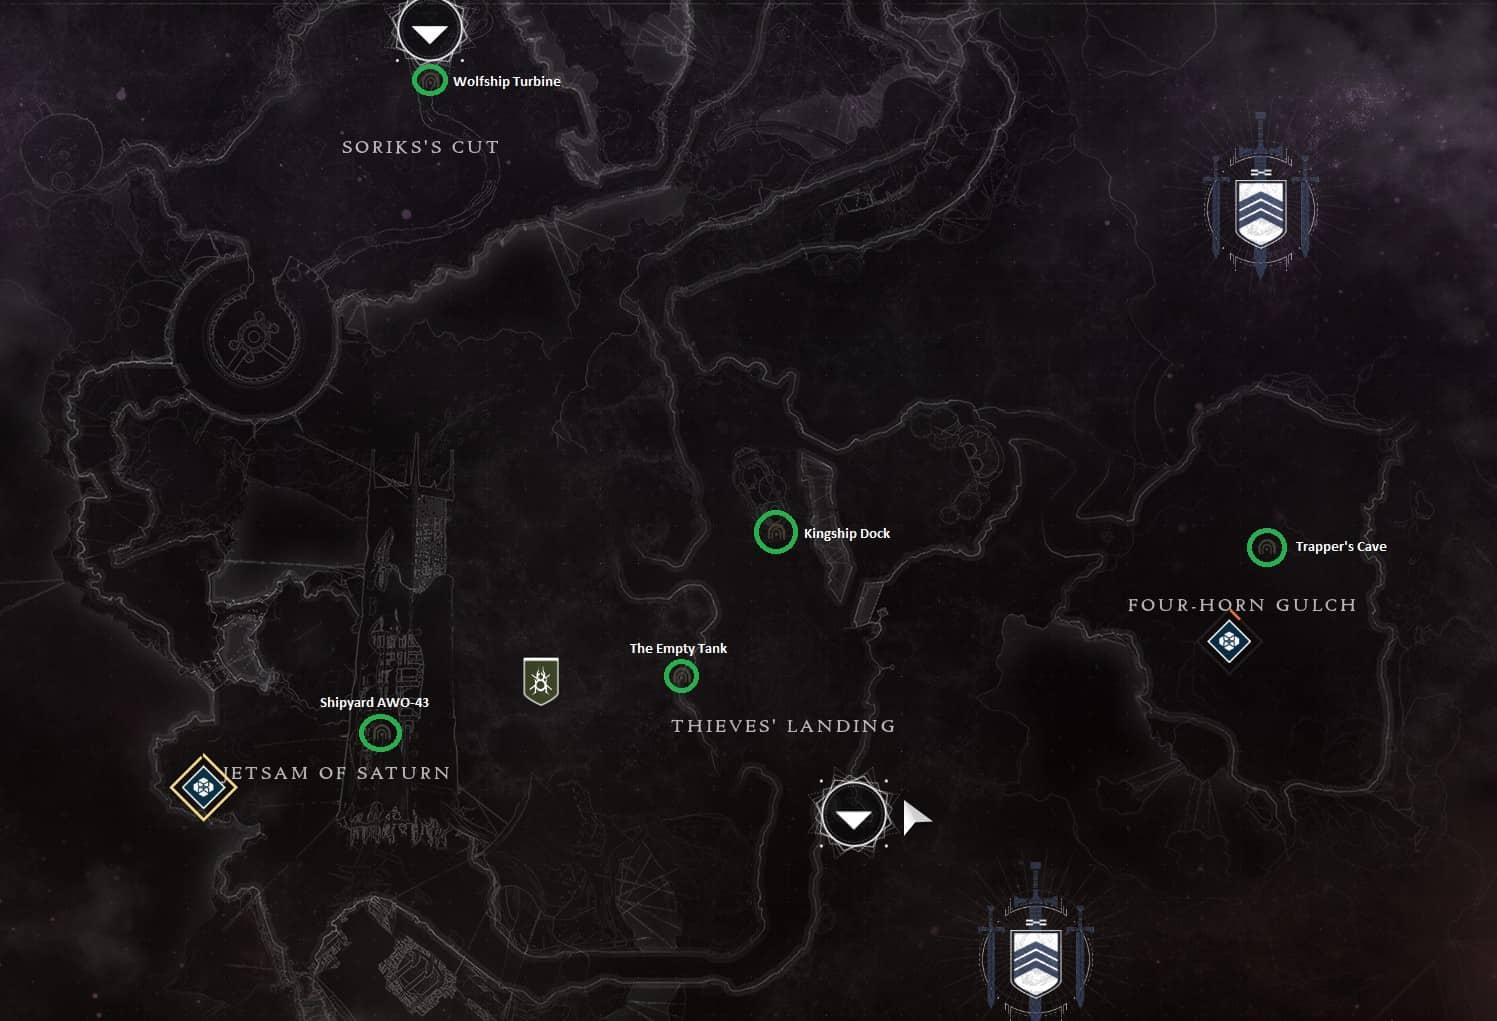 Lost Sector Maps For Destiny 2 And Destiny 2 Forsaken